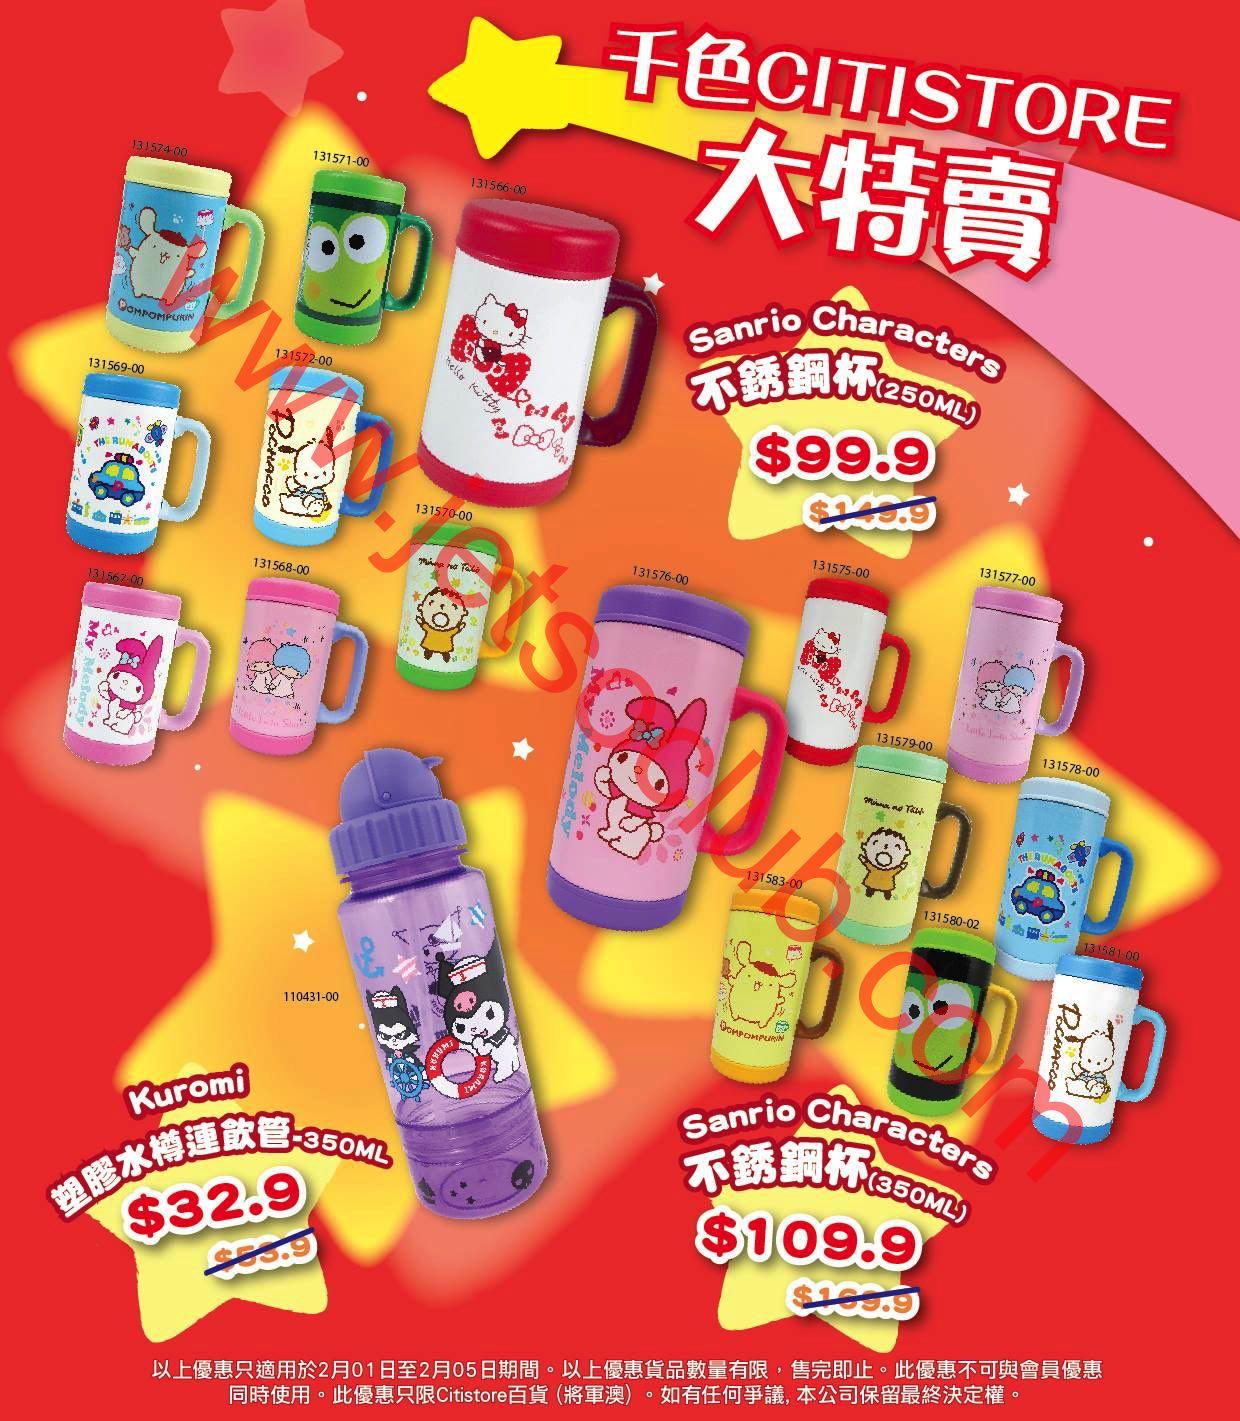 Sanrio Gift Gate:將軍澳千色店 大特賣 低至65折(至5/2) ( Jetso Club 著數俱樂部 )